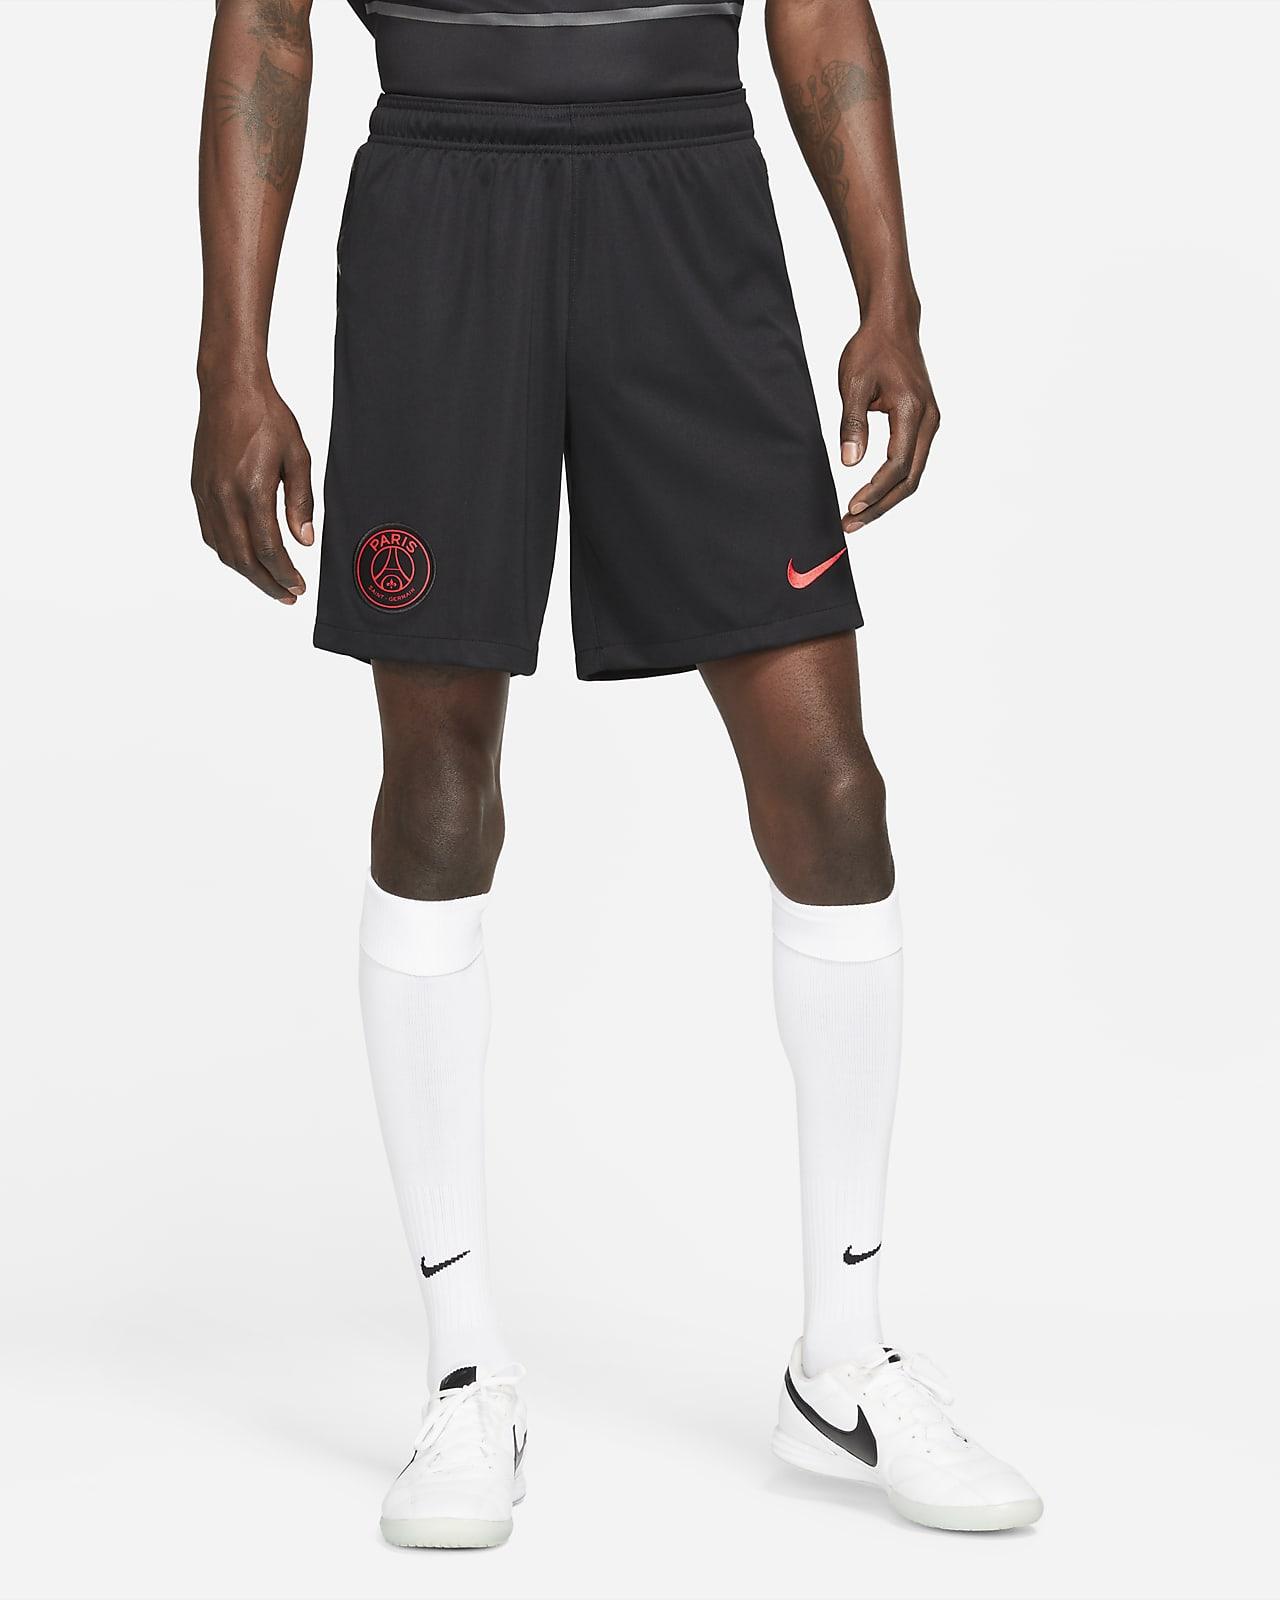 Paris Saint-Germain 2021/22 Stadium Third Men's Nike Dri-FIT Football Shorts